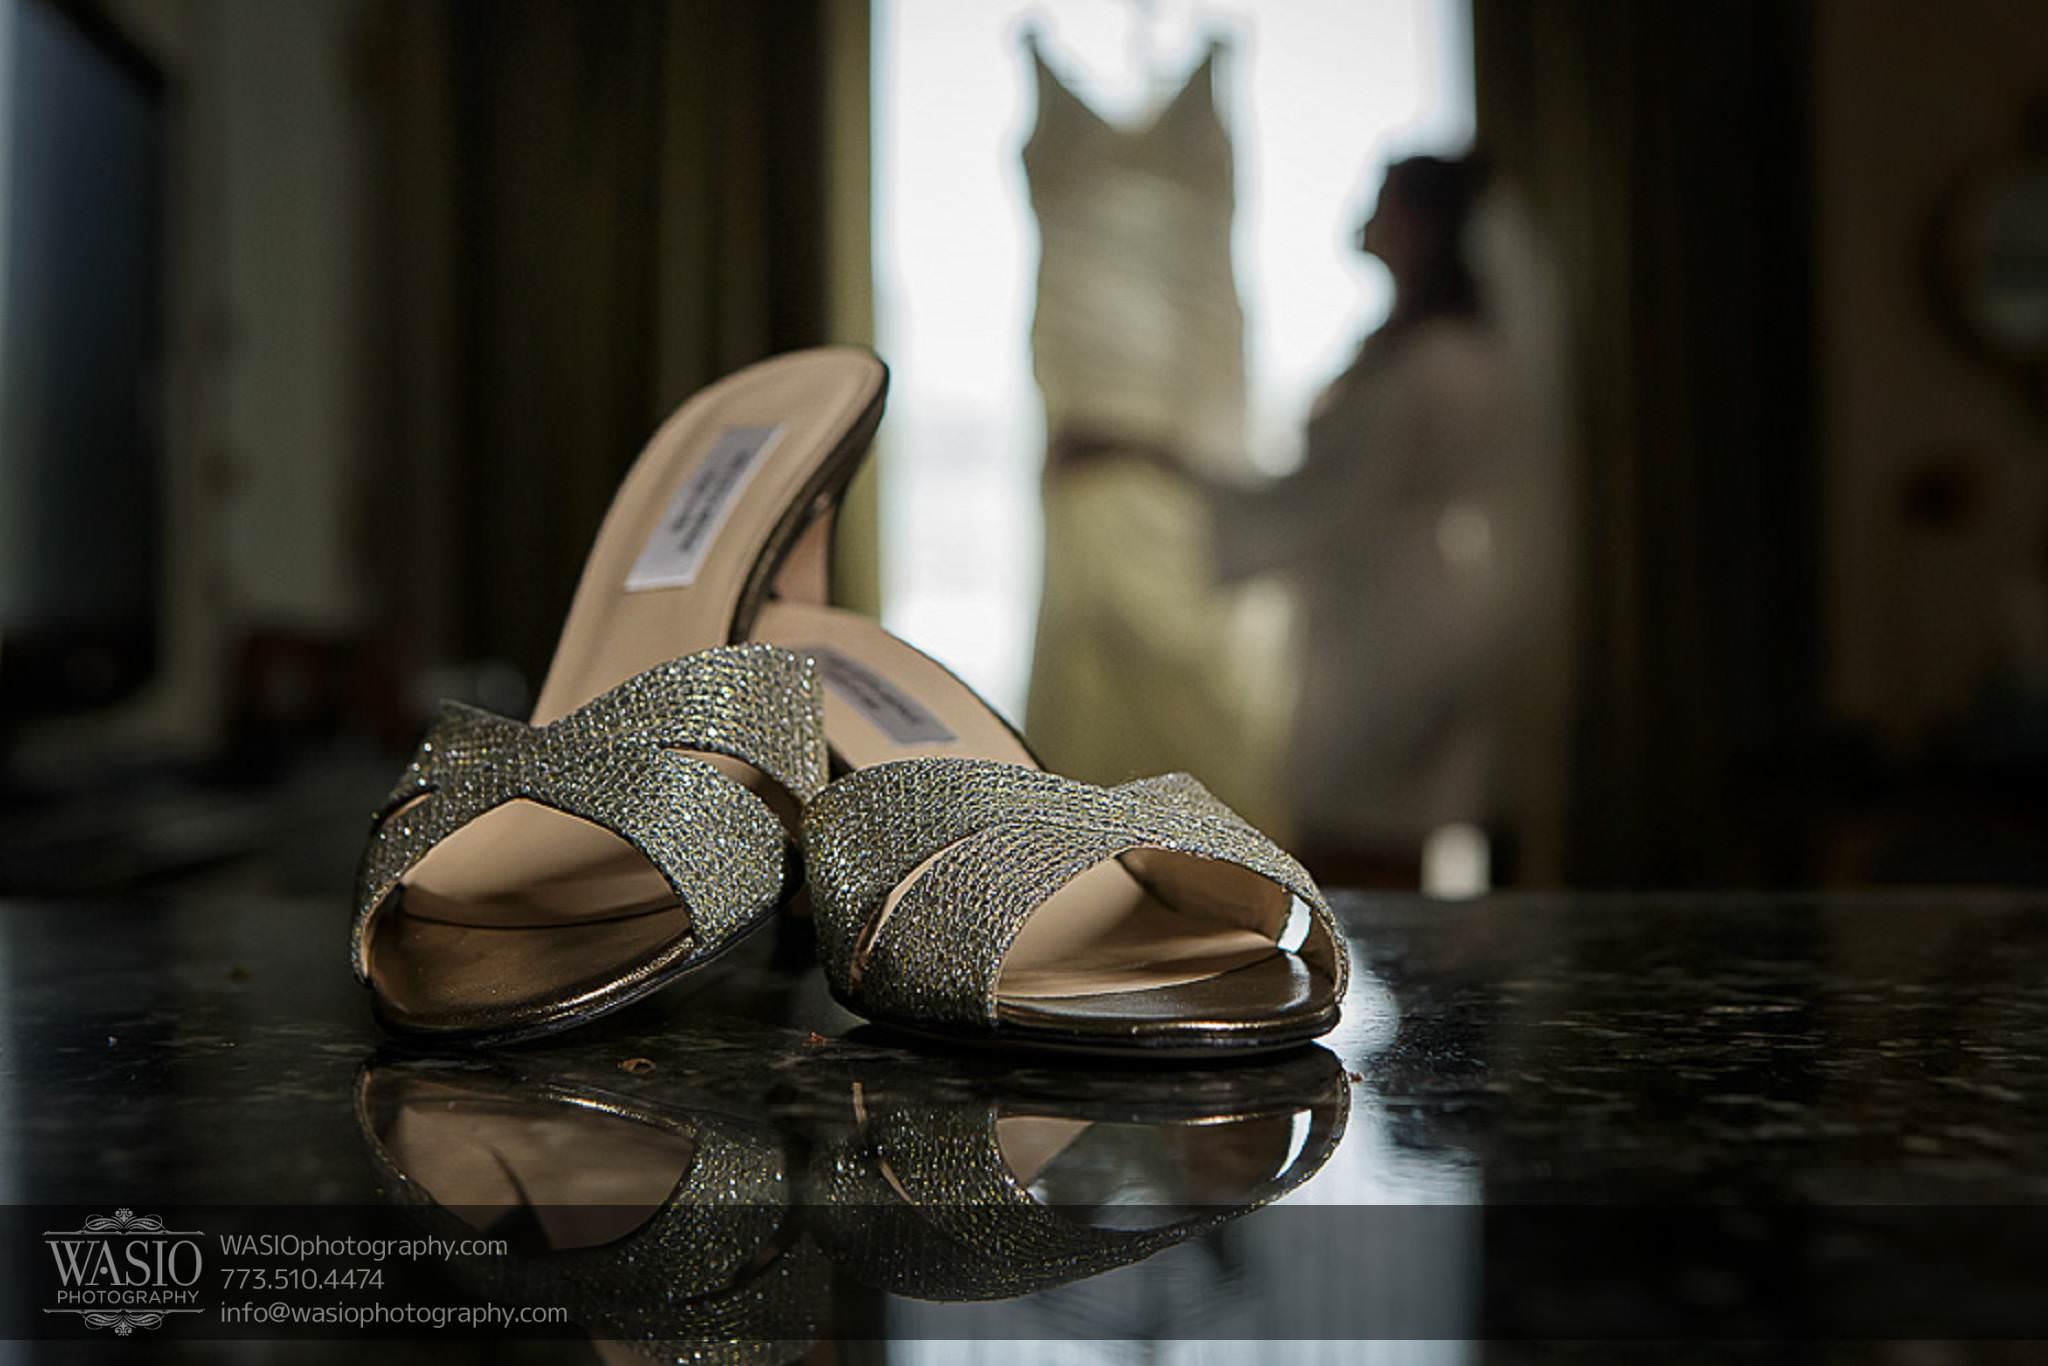 Chicago-wedding-photos-bridal-shoes-preparation-reflection-wedding-dress-unique-abstract-043 Chicago Wedding Photos - Svetlana + Yuriy